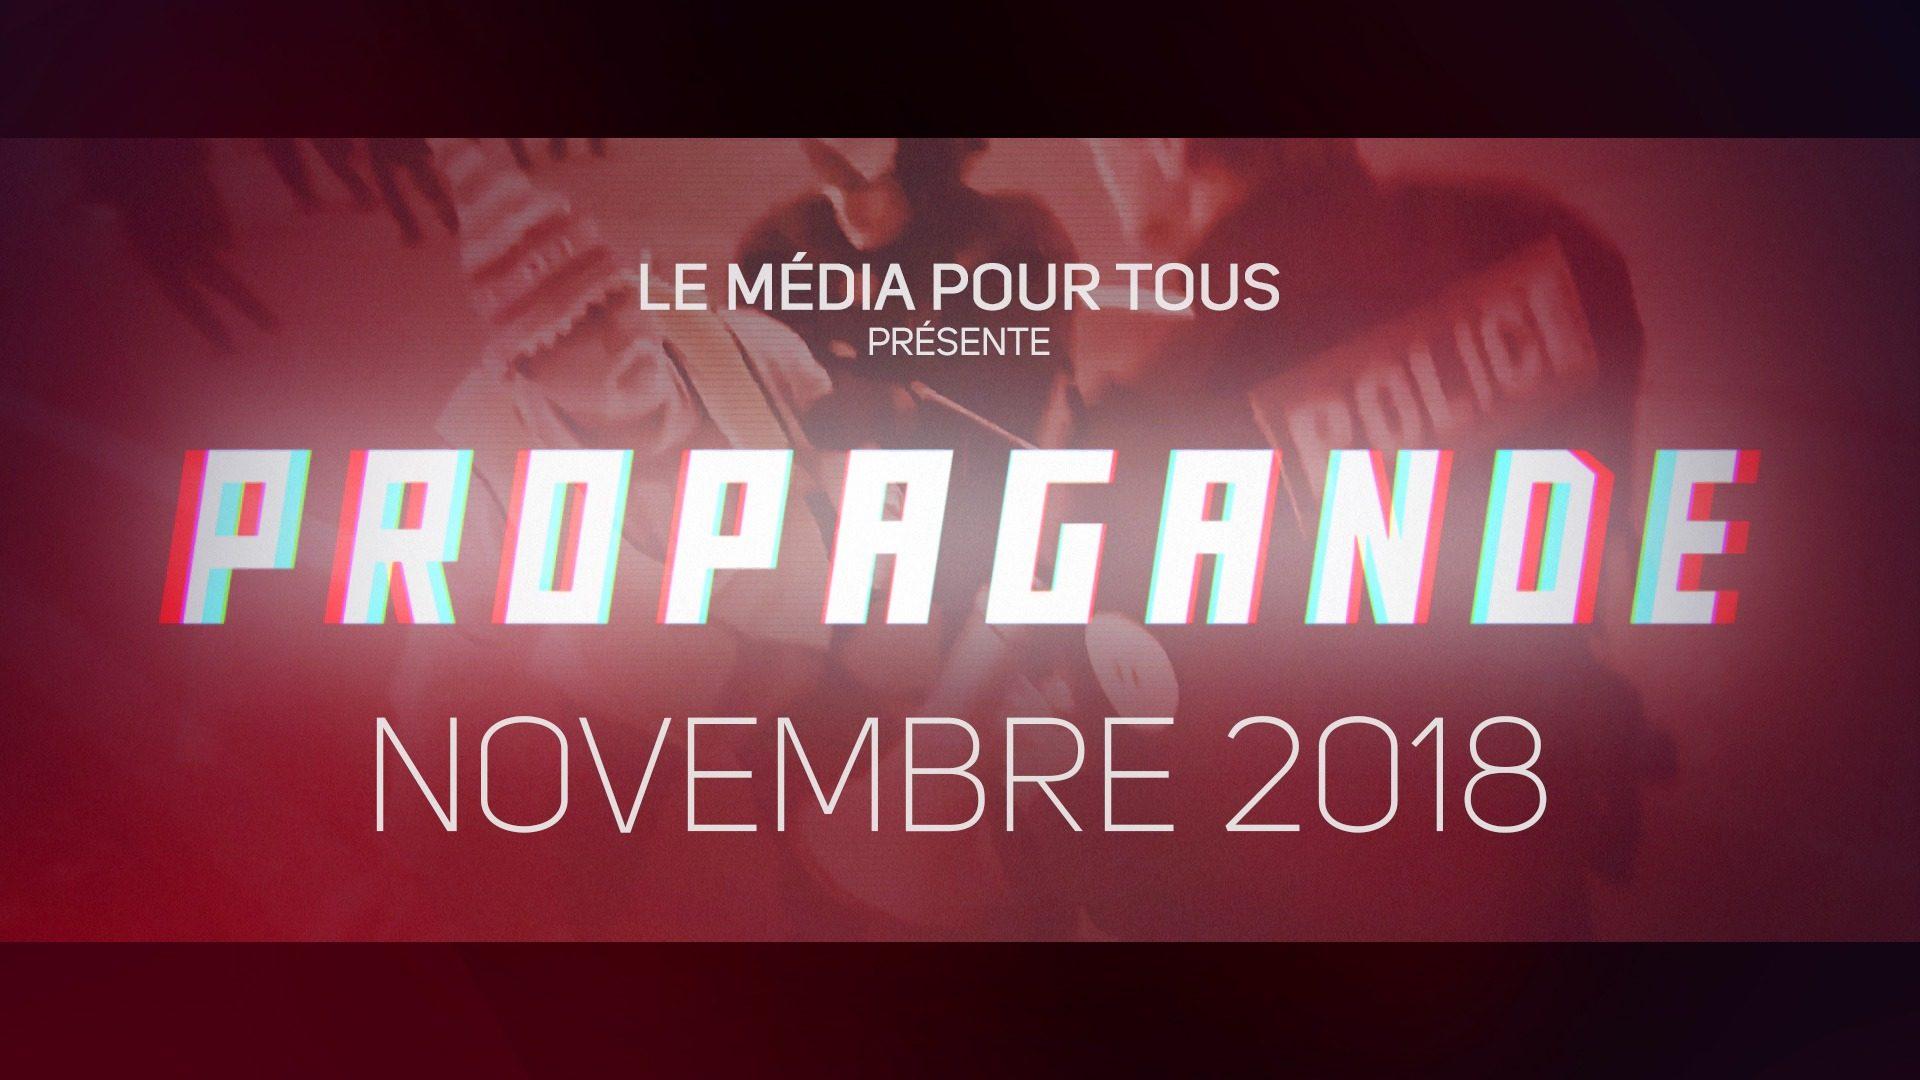 Propagande Novembre 2018